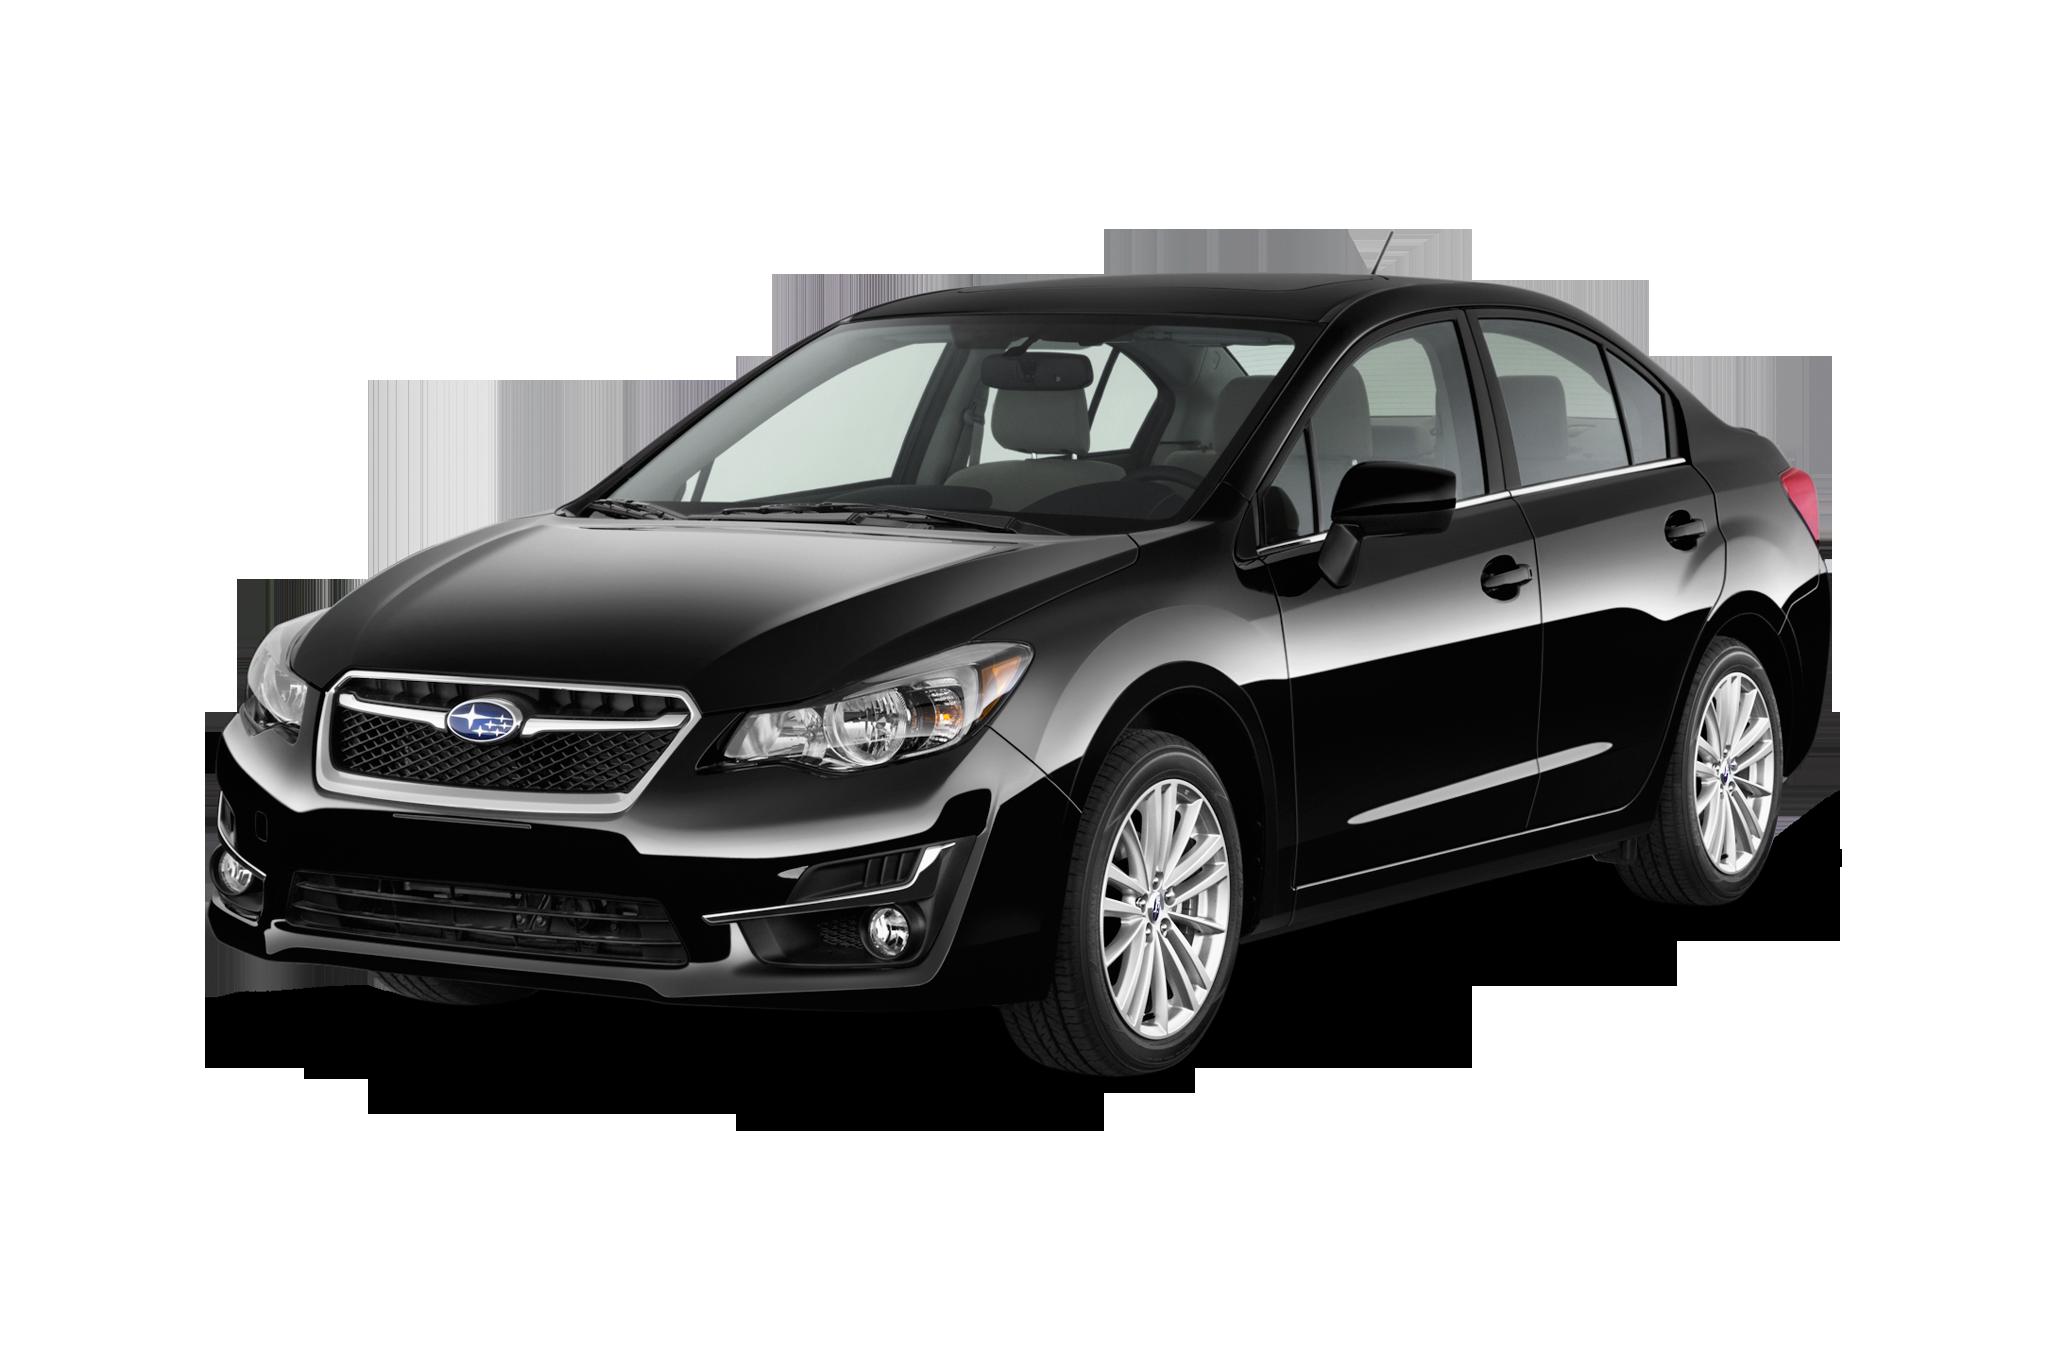 2016 impreza hatchback specs